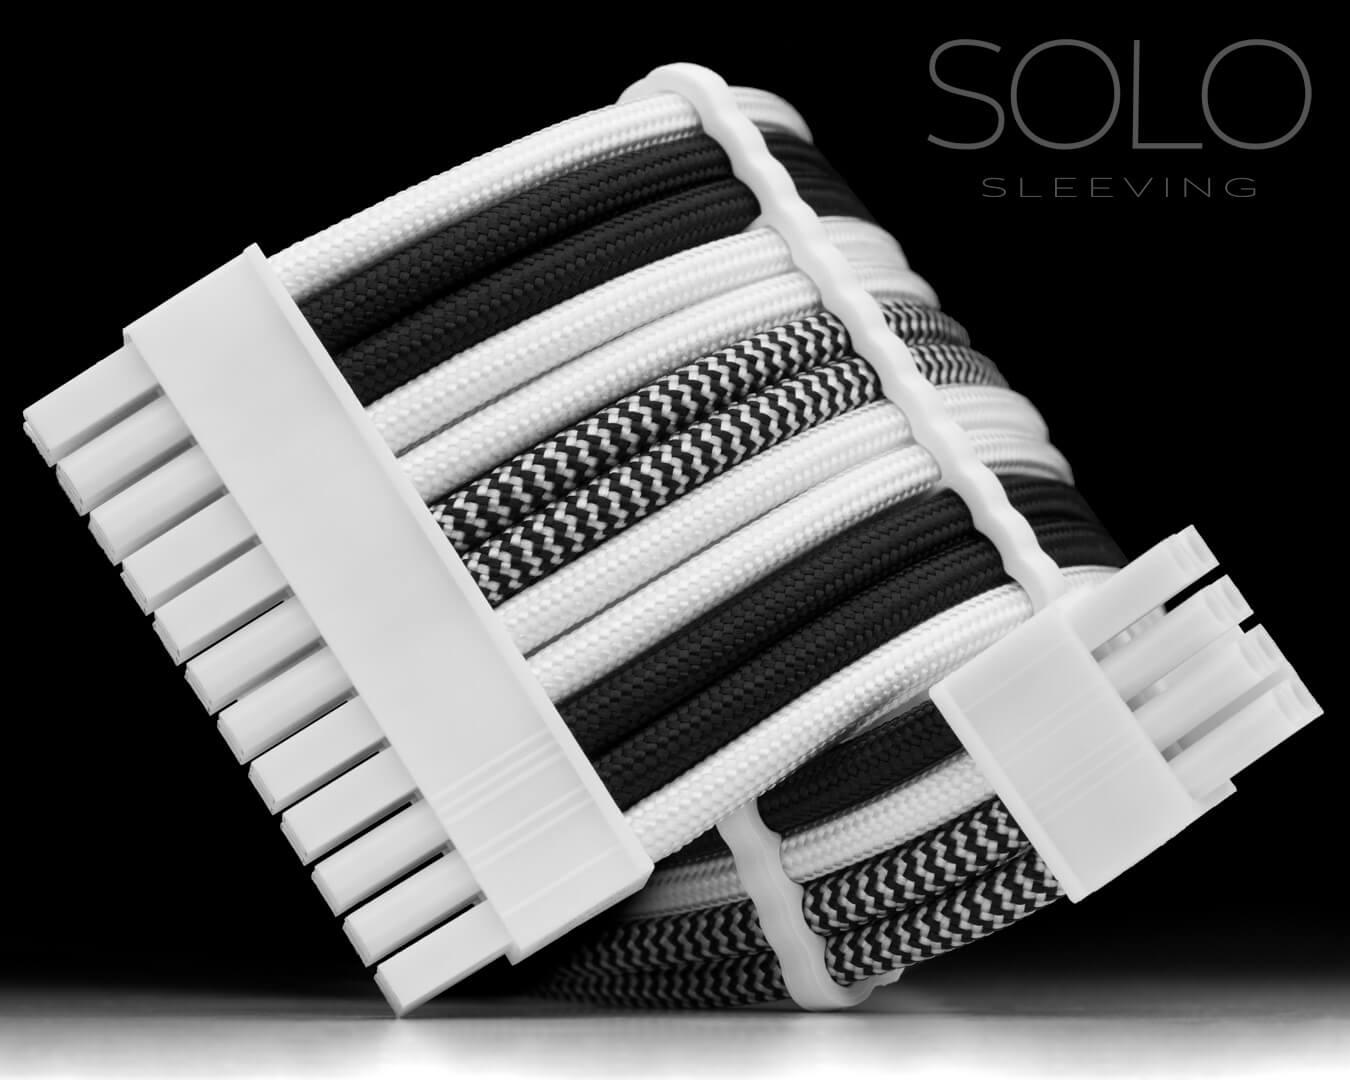 Black and White Designed PSU Cables